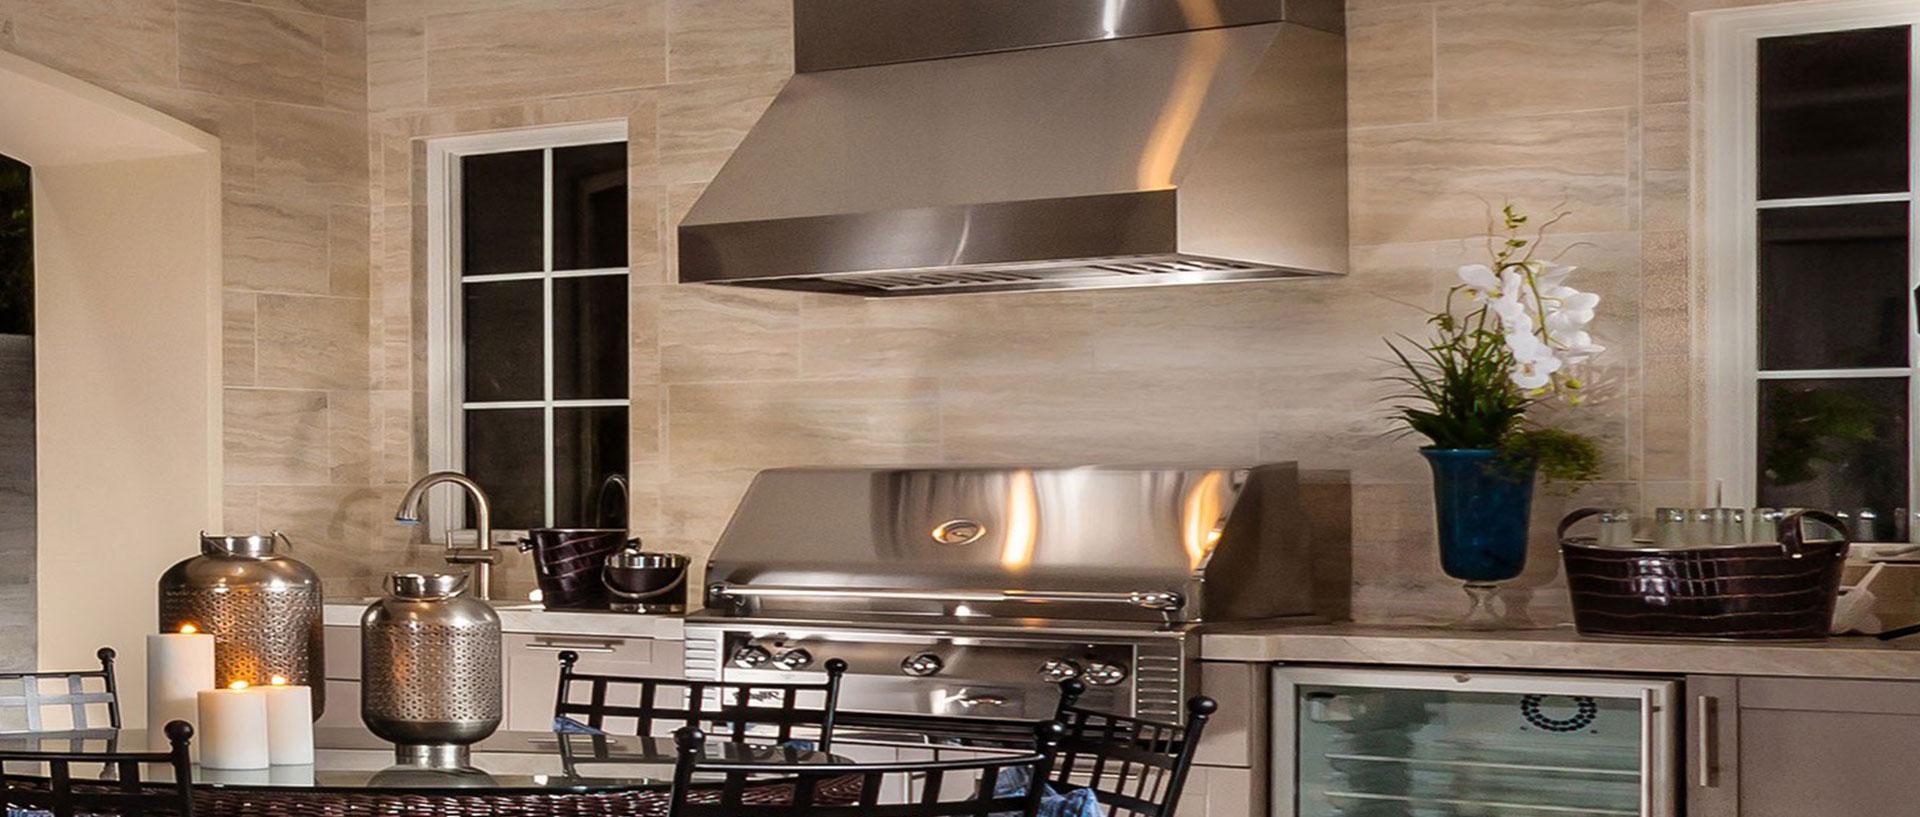 internal venting vs external venting appliances connection